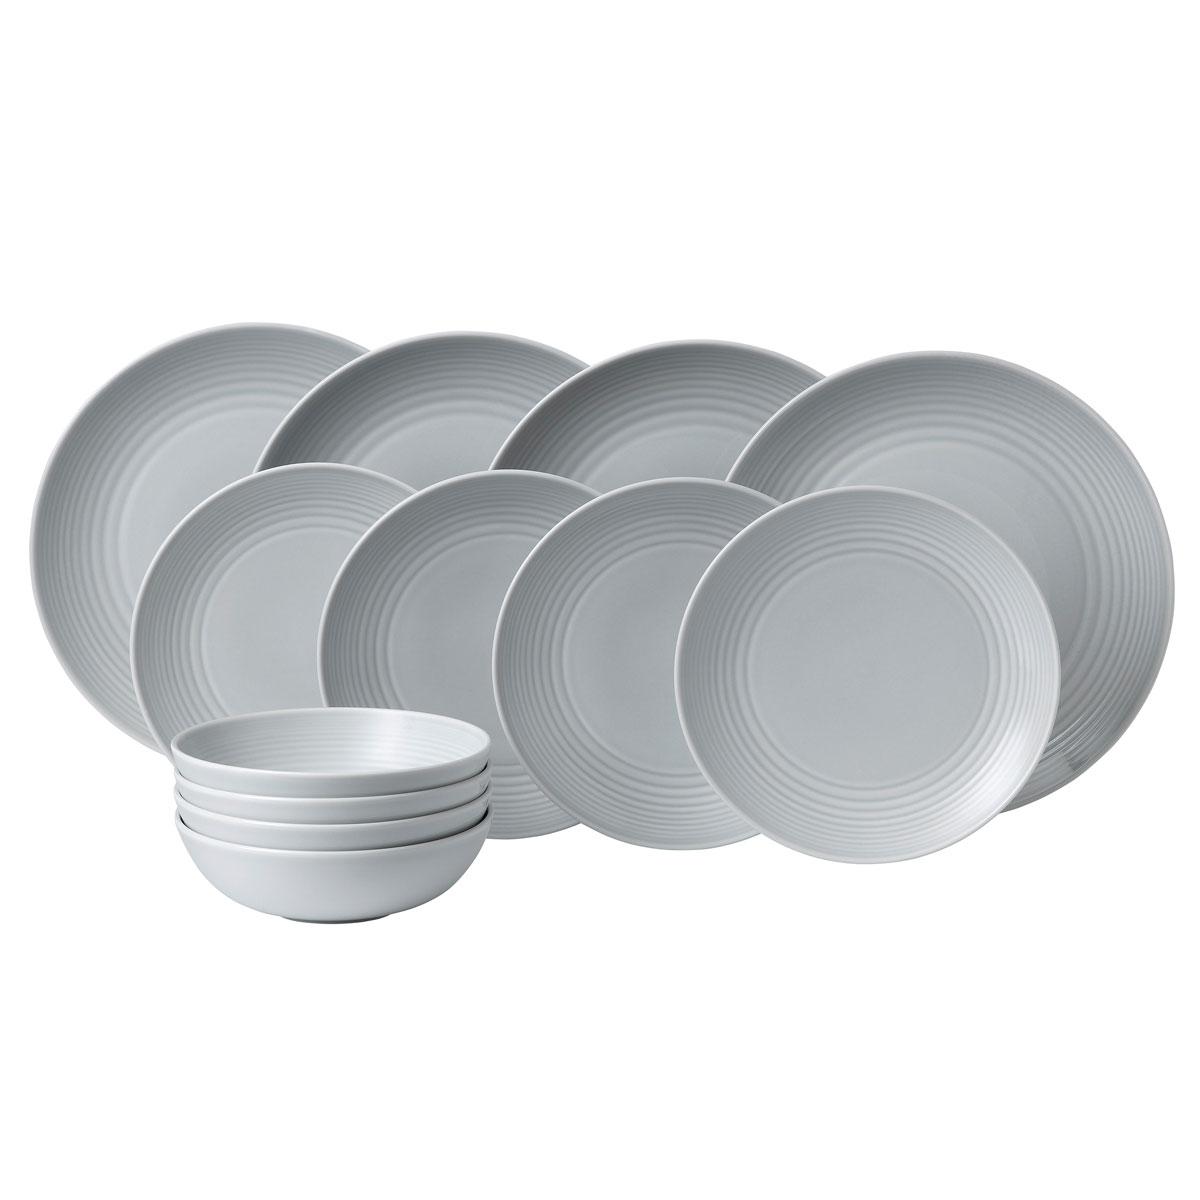 Royal Doulton Gordon Ramsay Maze Light Grey 12-Piece Set